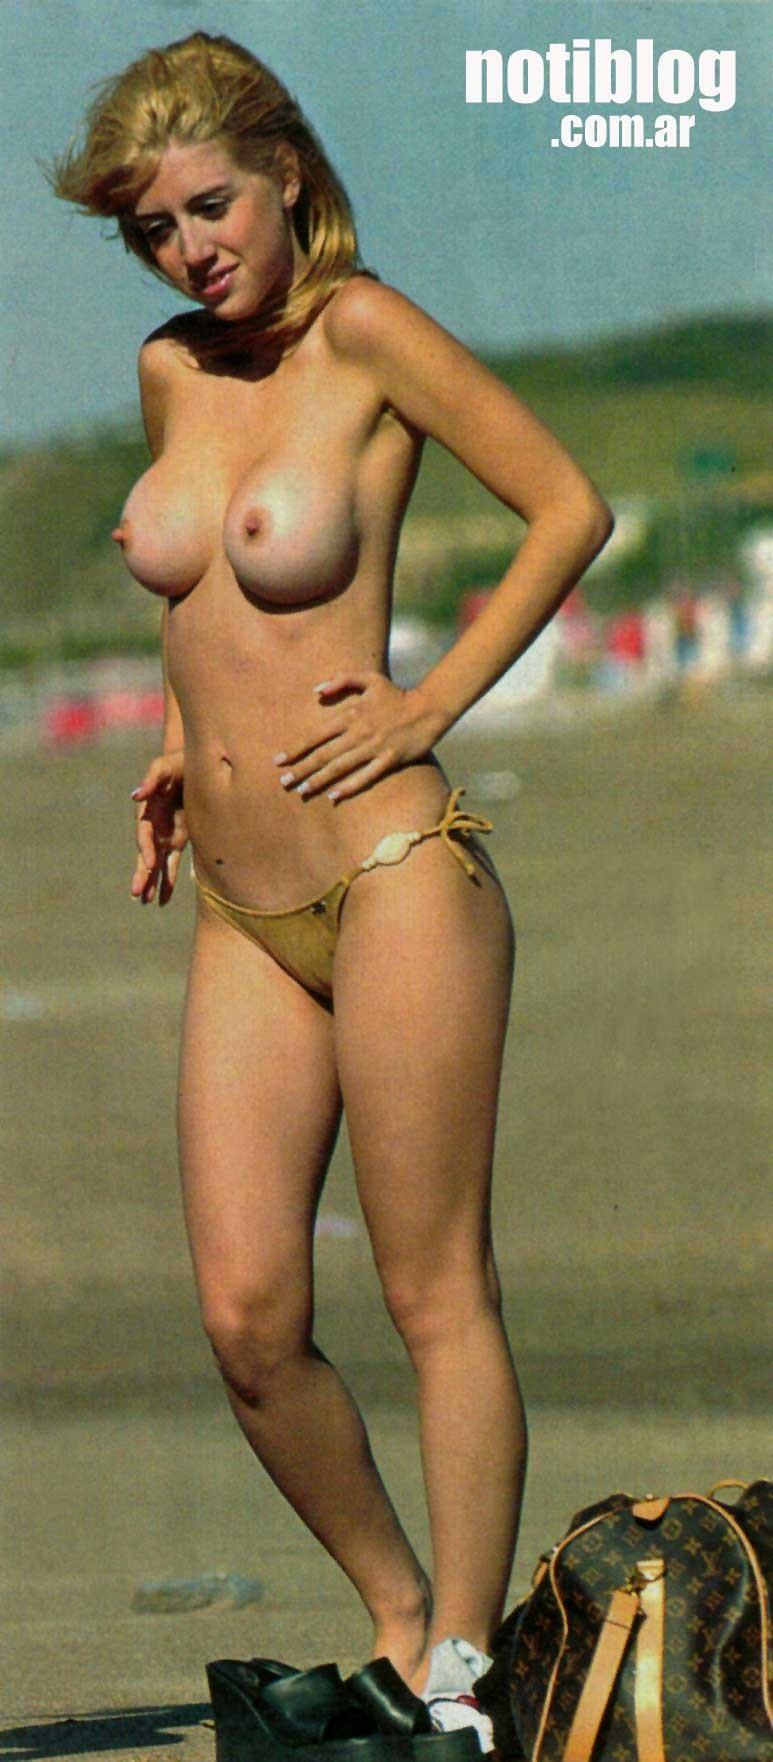 wanda nara topless